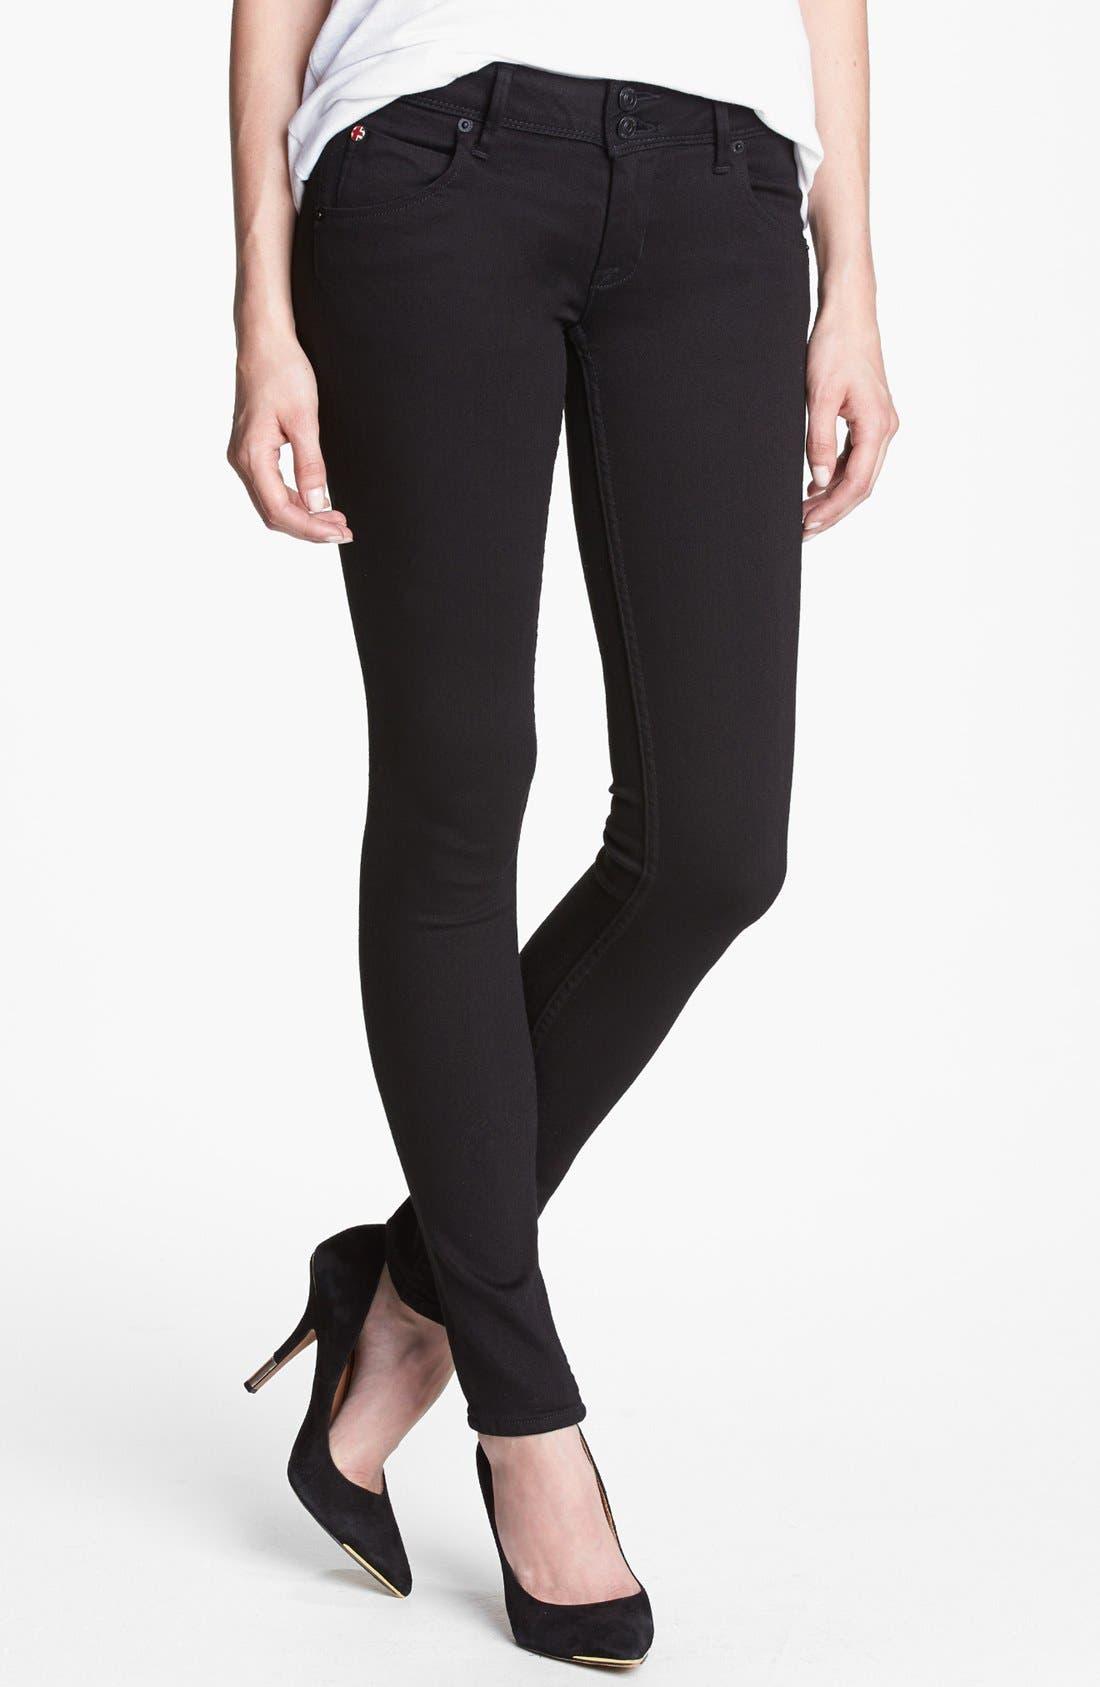 Alternate Image 1 Selected - Hudson Jeans 'Collin' Skinny Jeans (Black)